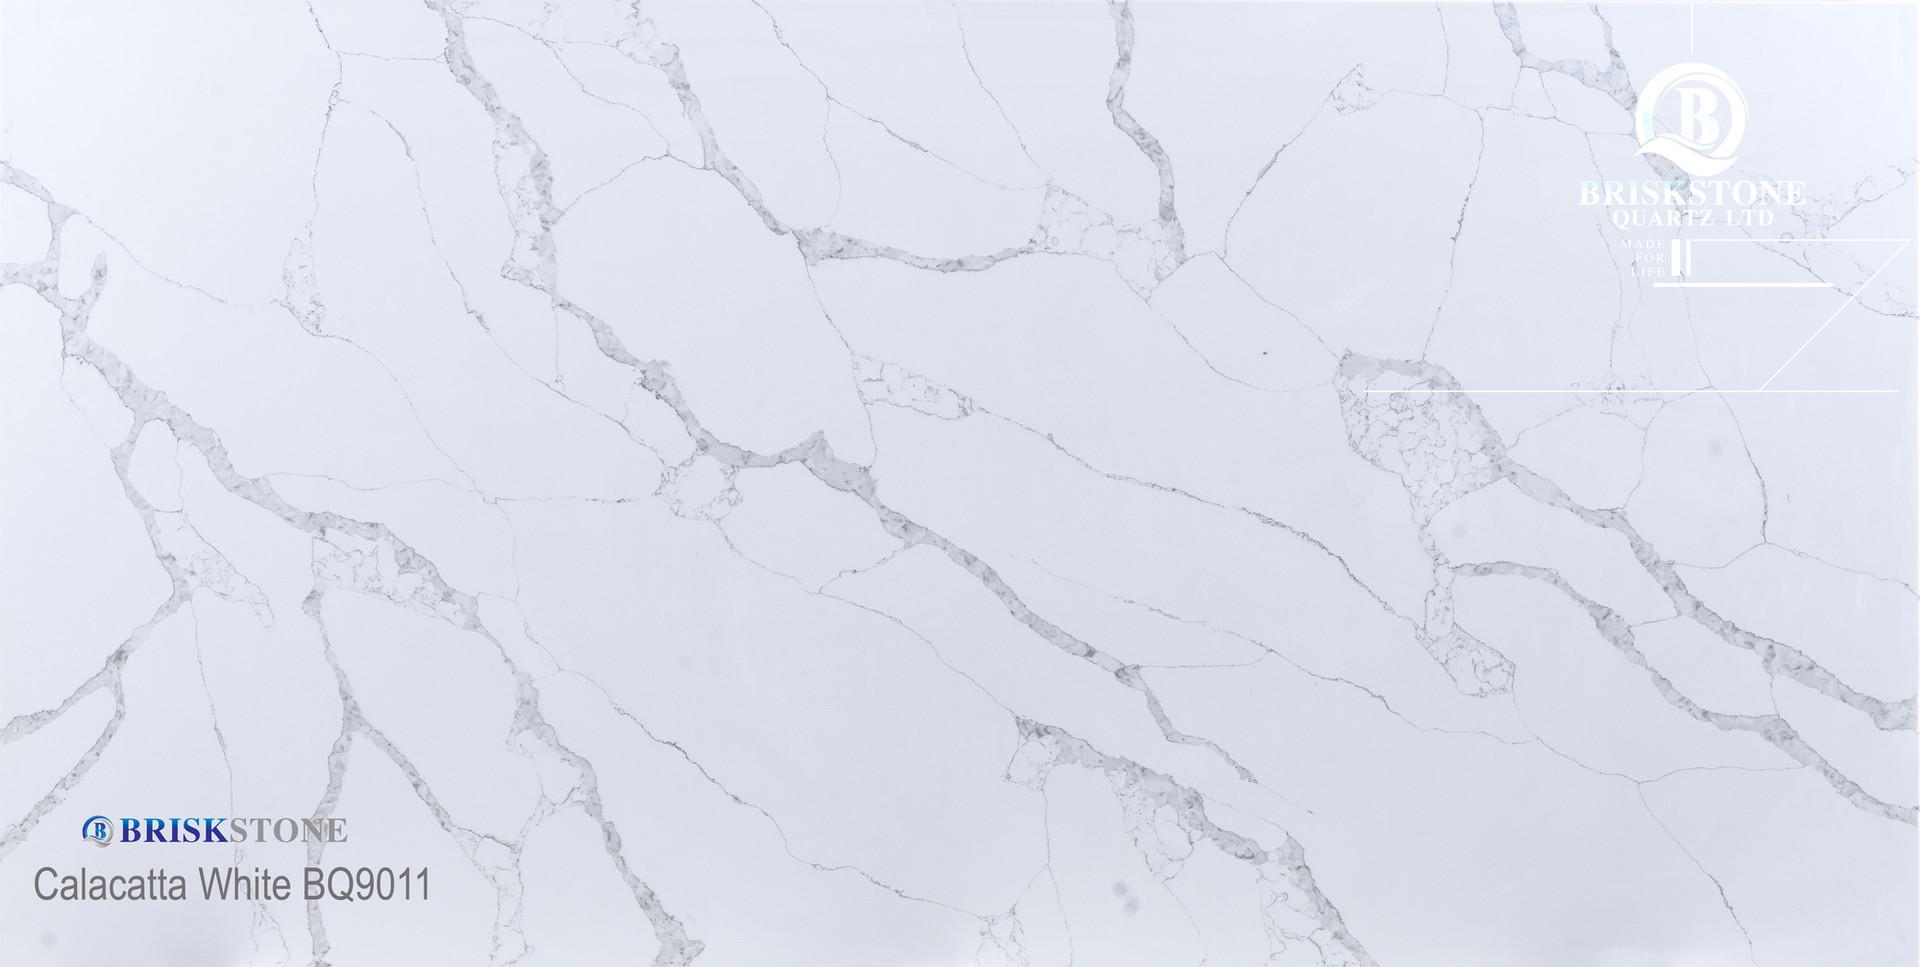 Calacatta White BQ 9011